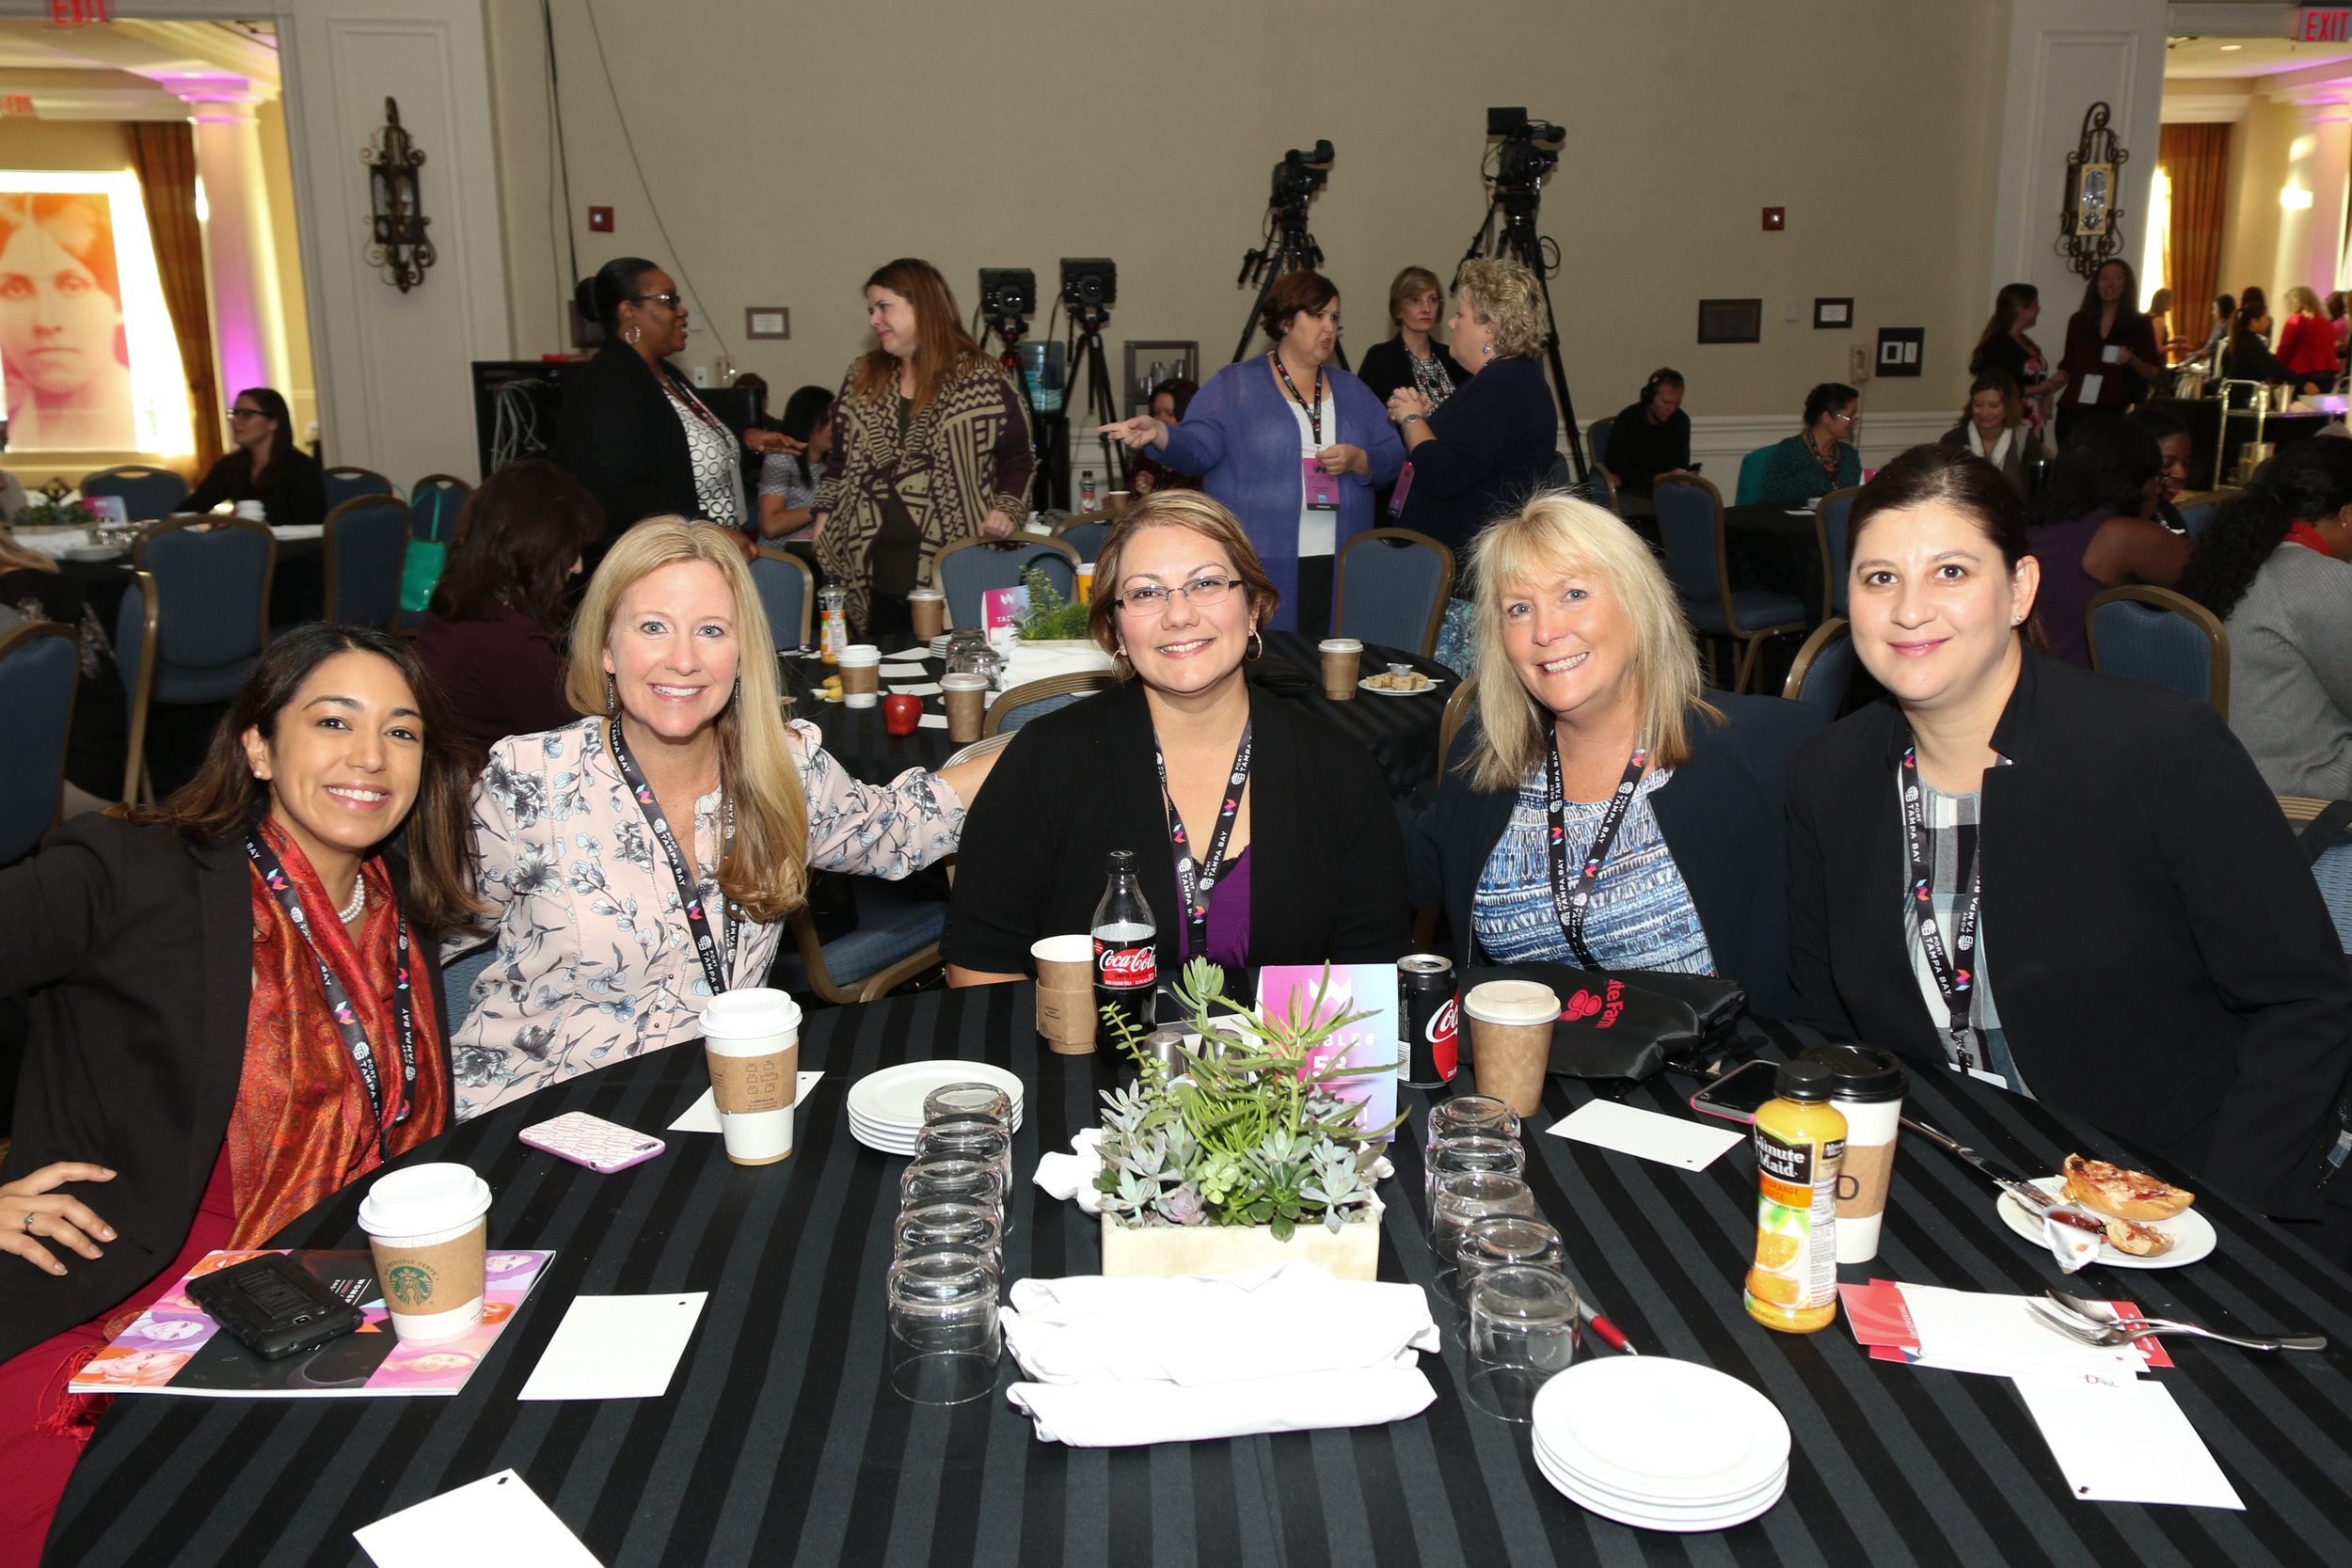 465_WomensConference_10-27-17.jpg